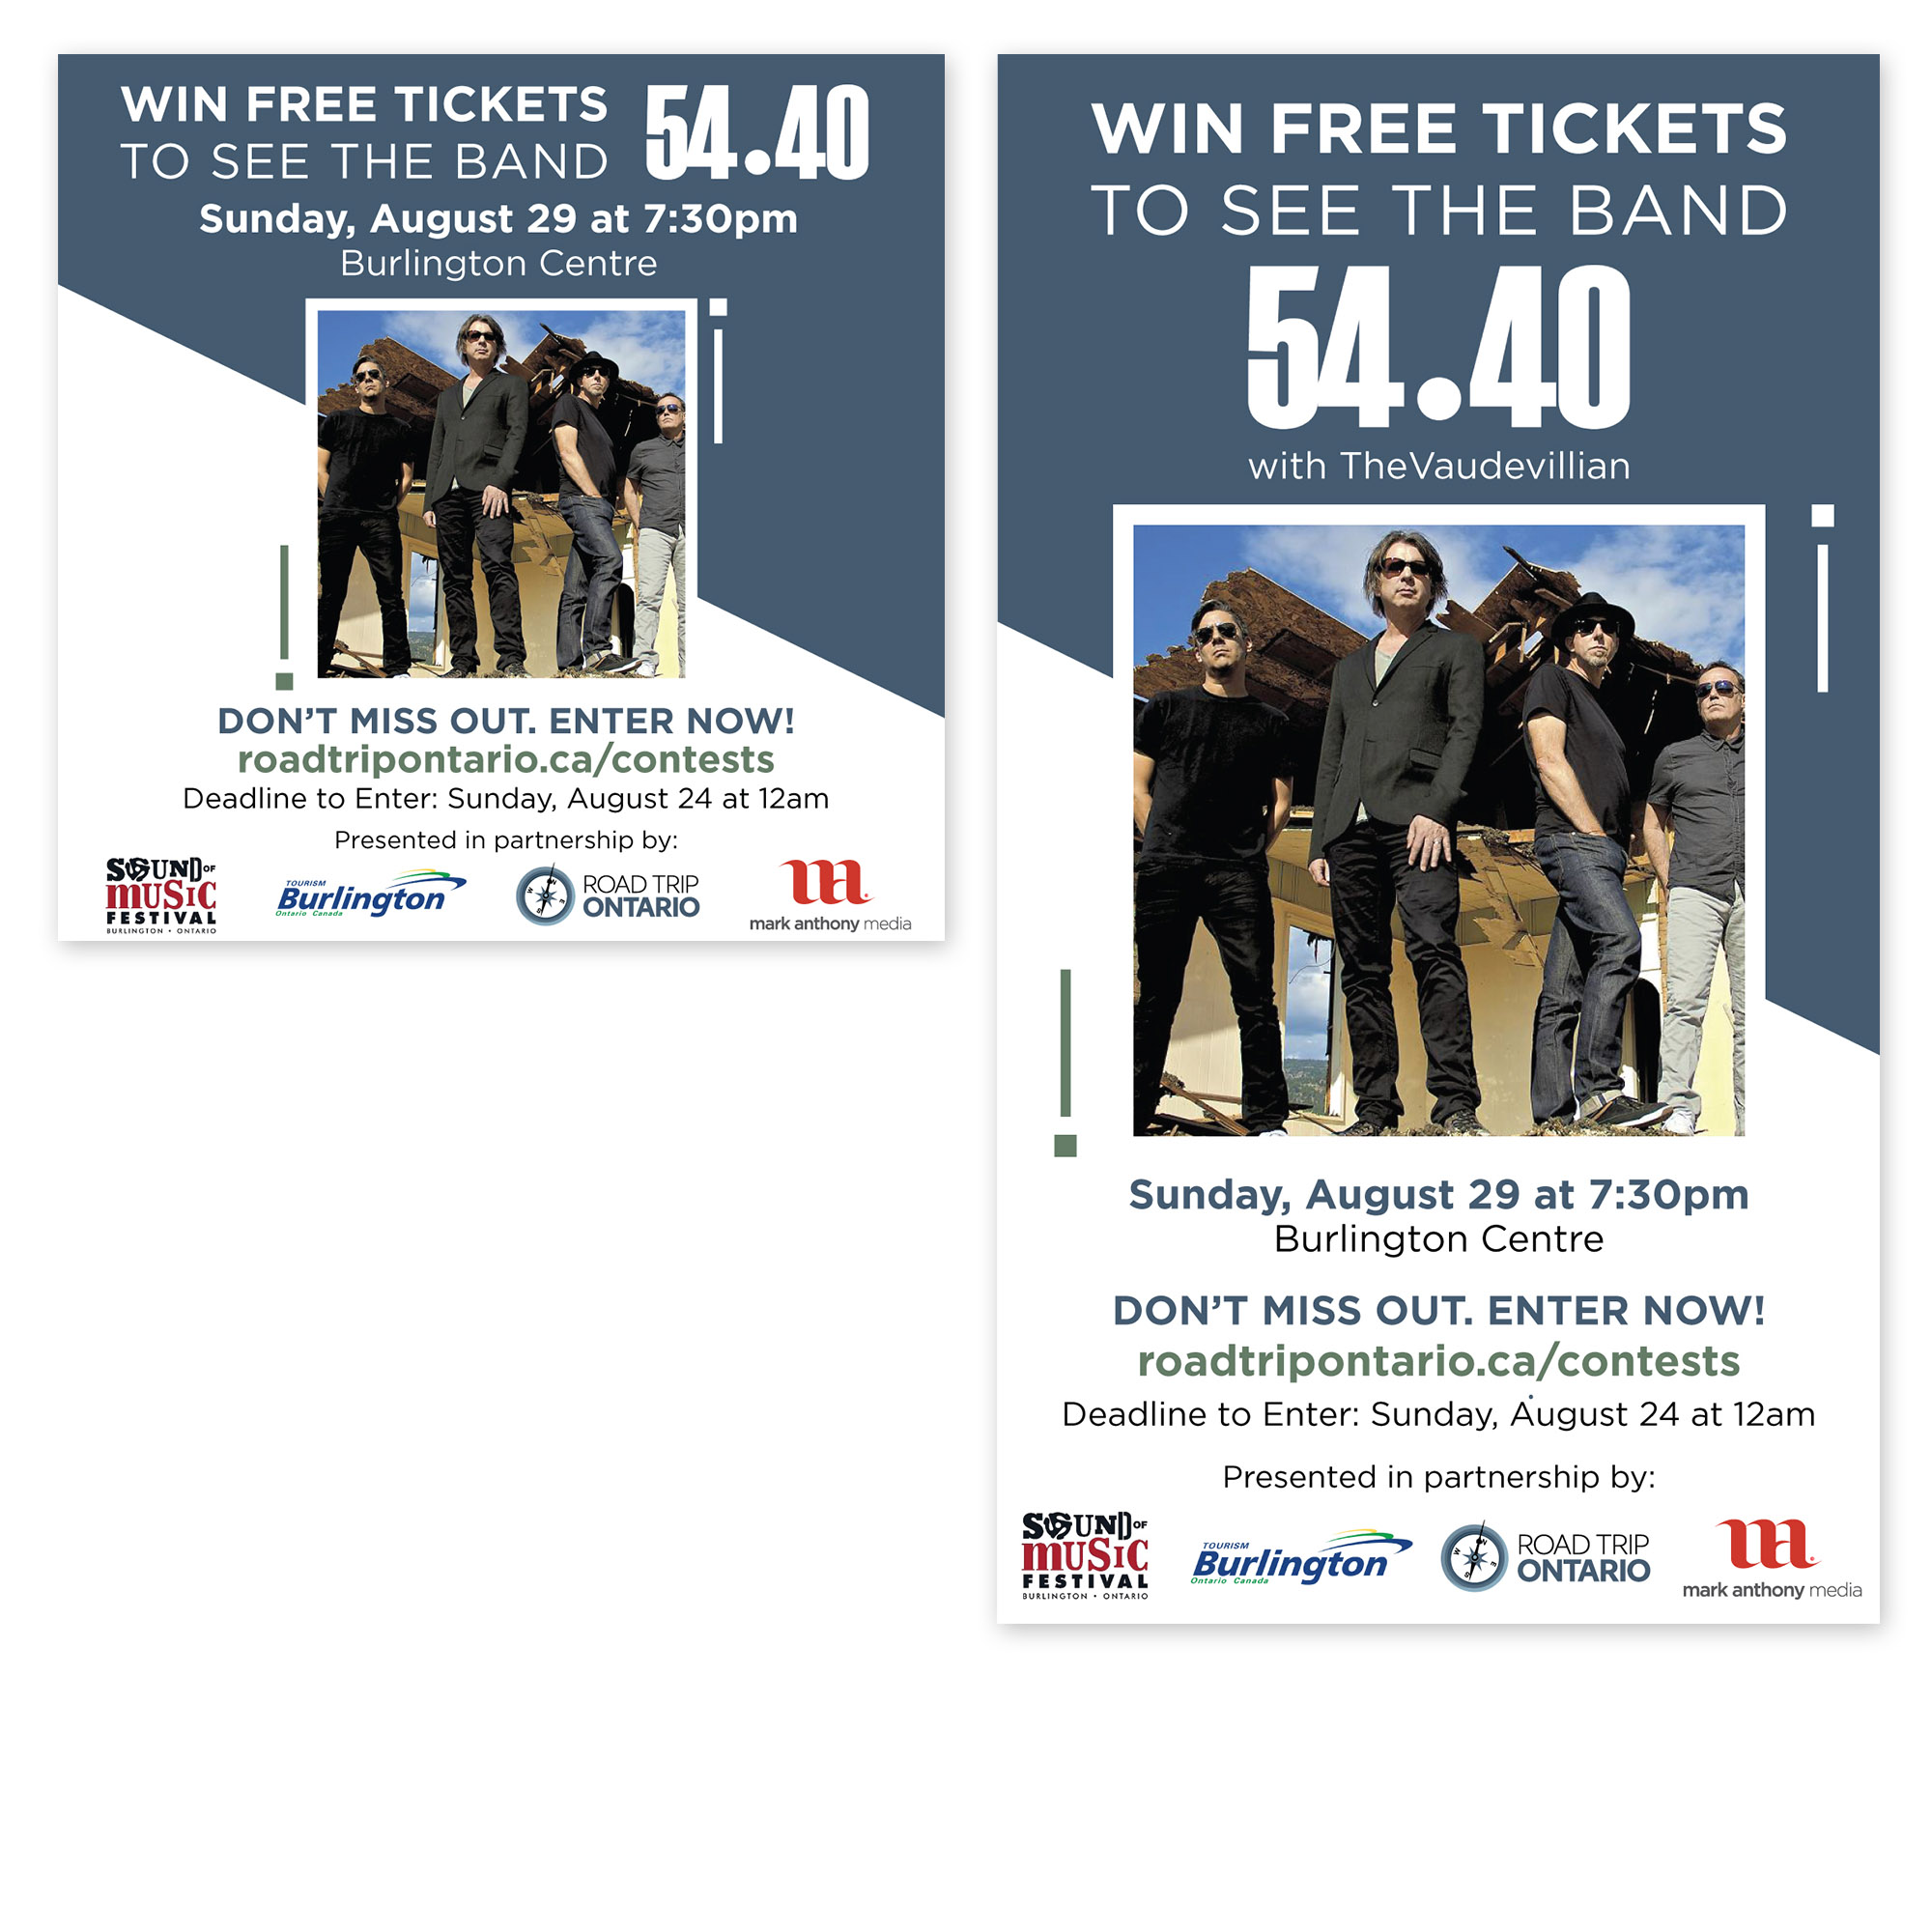 Road Trip Ontario - Sound of Music Festival Contest - Social Media Marketing